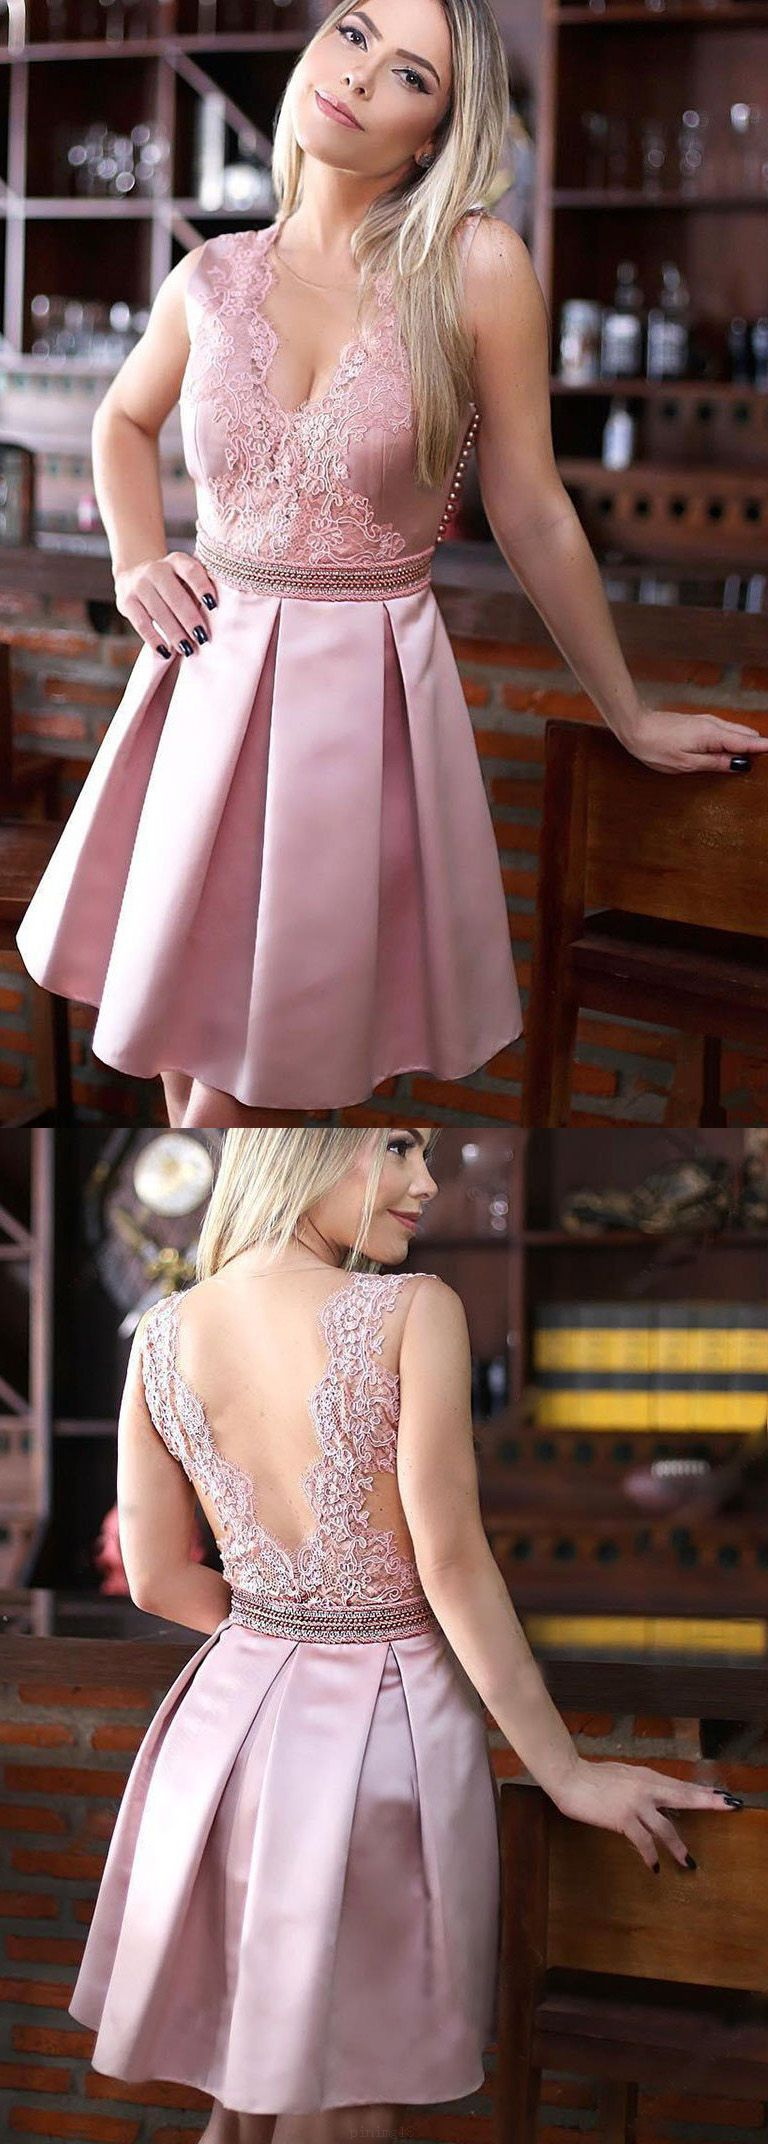 Customized pink alineprincess homecoming prom dresses fancy short